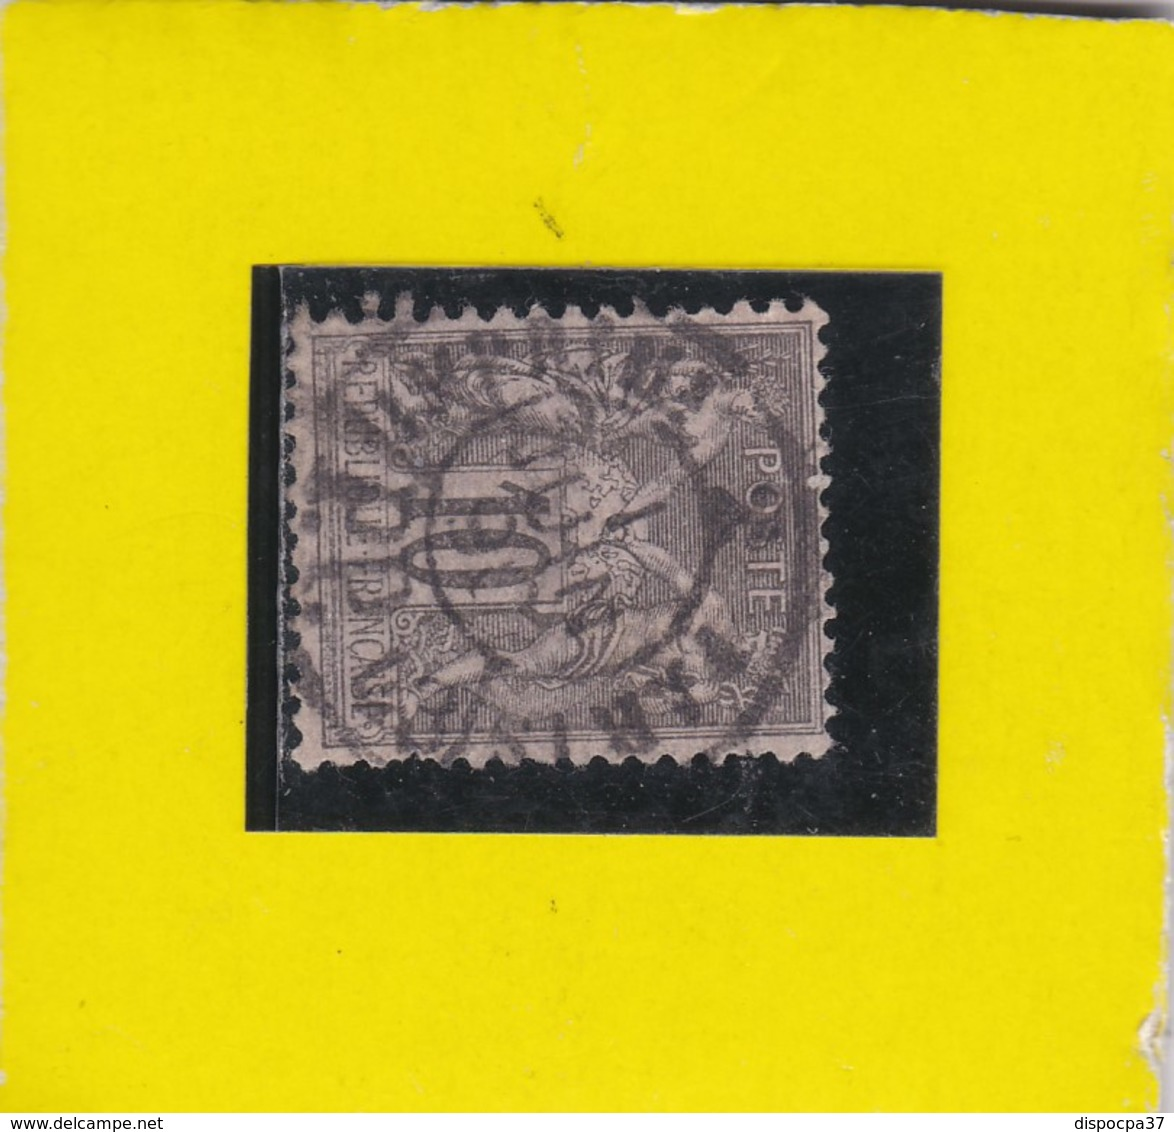 SAGE N° 89 CACHET IMPRIMES PP43 PARIS  1 JUIN 1890 -REF 14017 - 1876-1898 Sage (Type II)